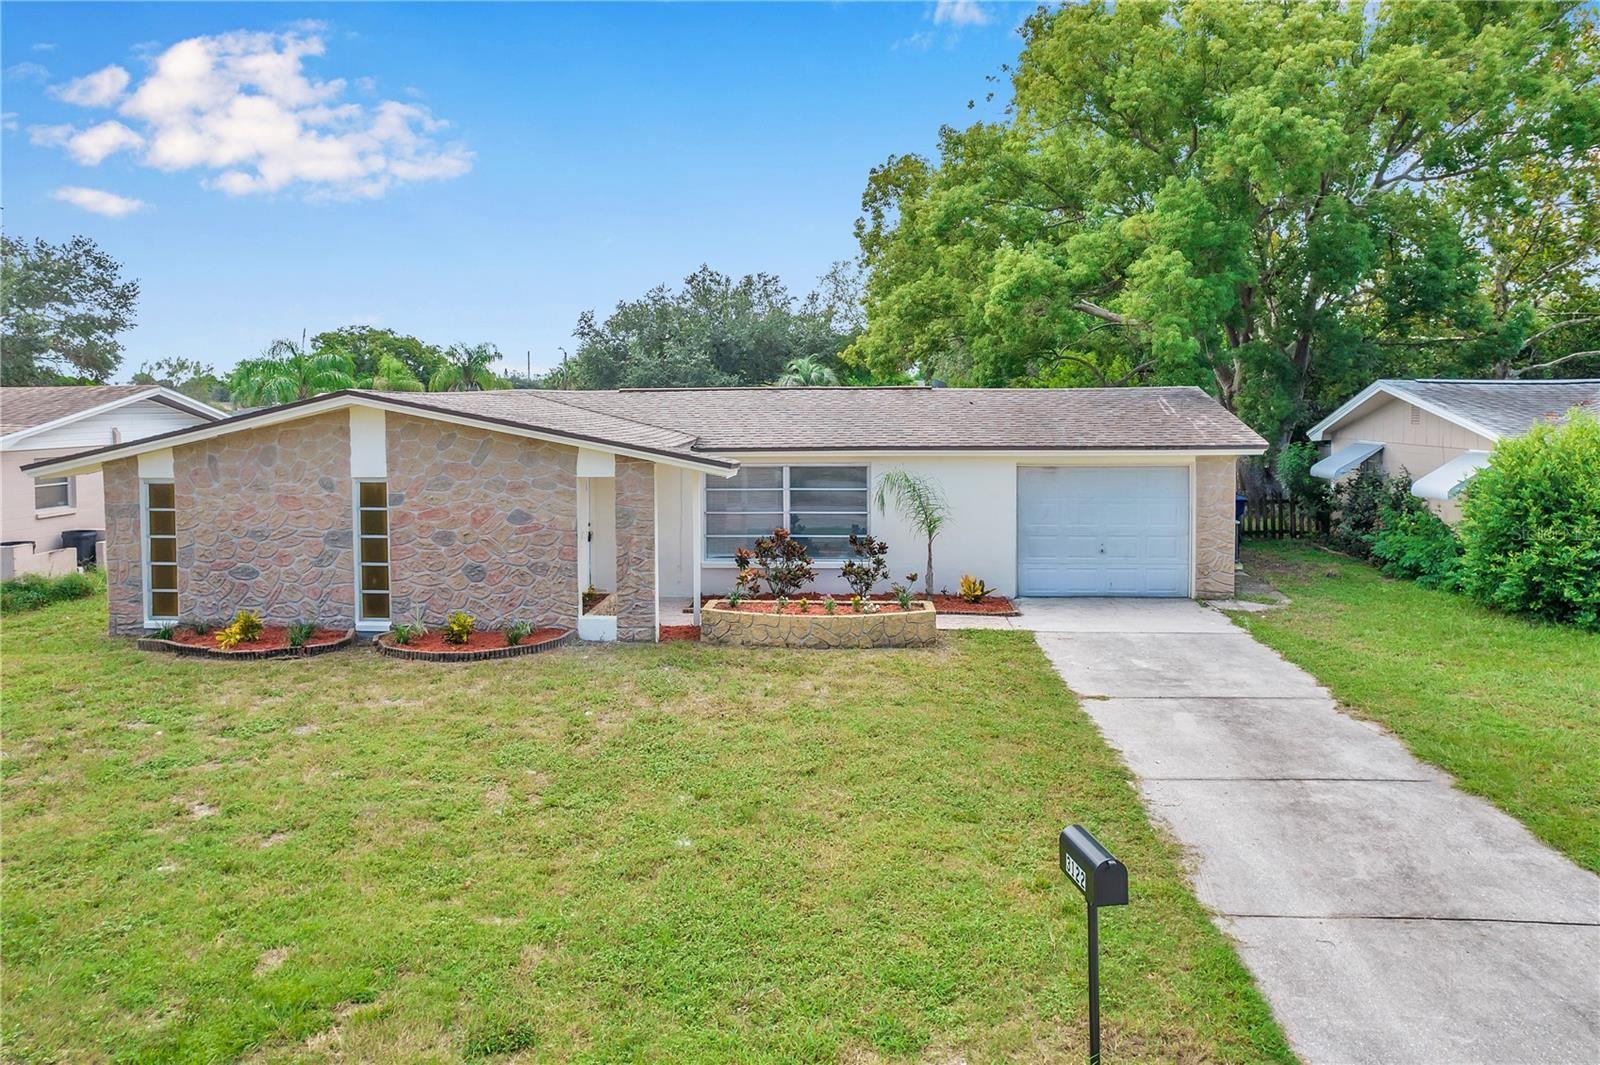 3122 PALAMORE DR, Holiday, FL 34691 - MLS#: W7837940